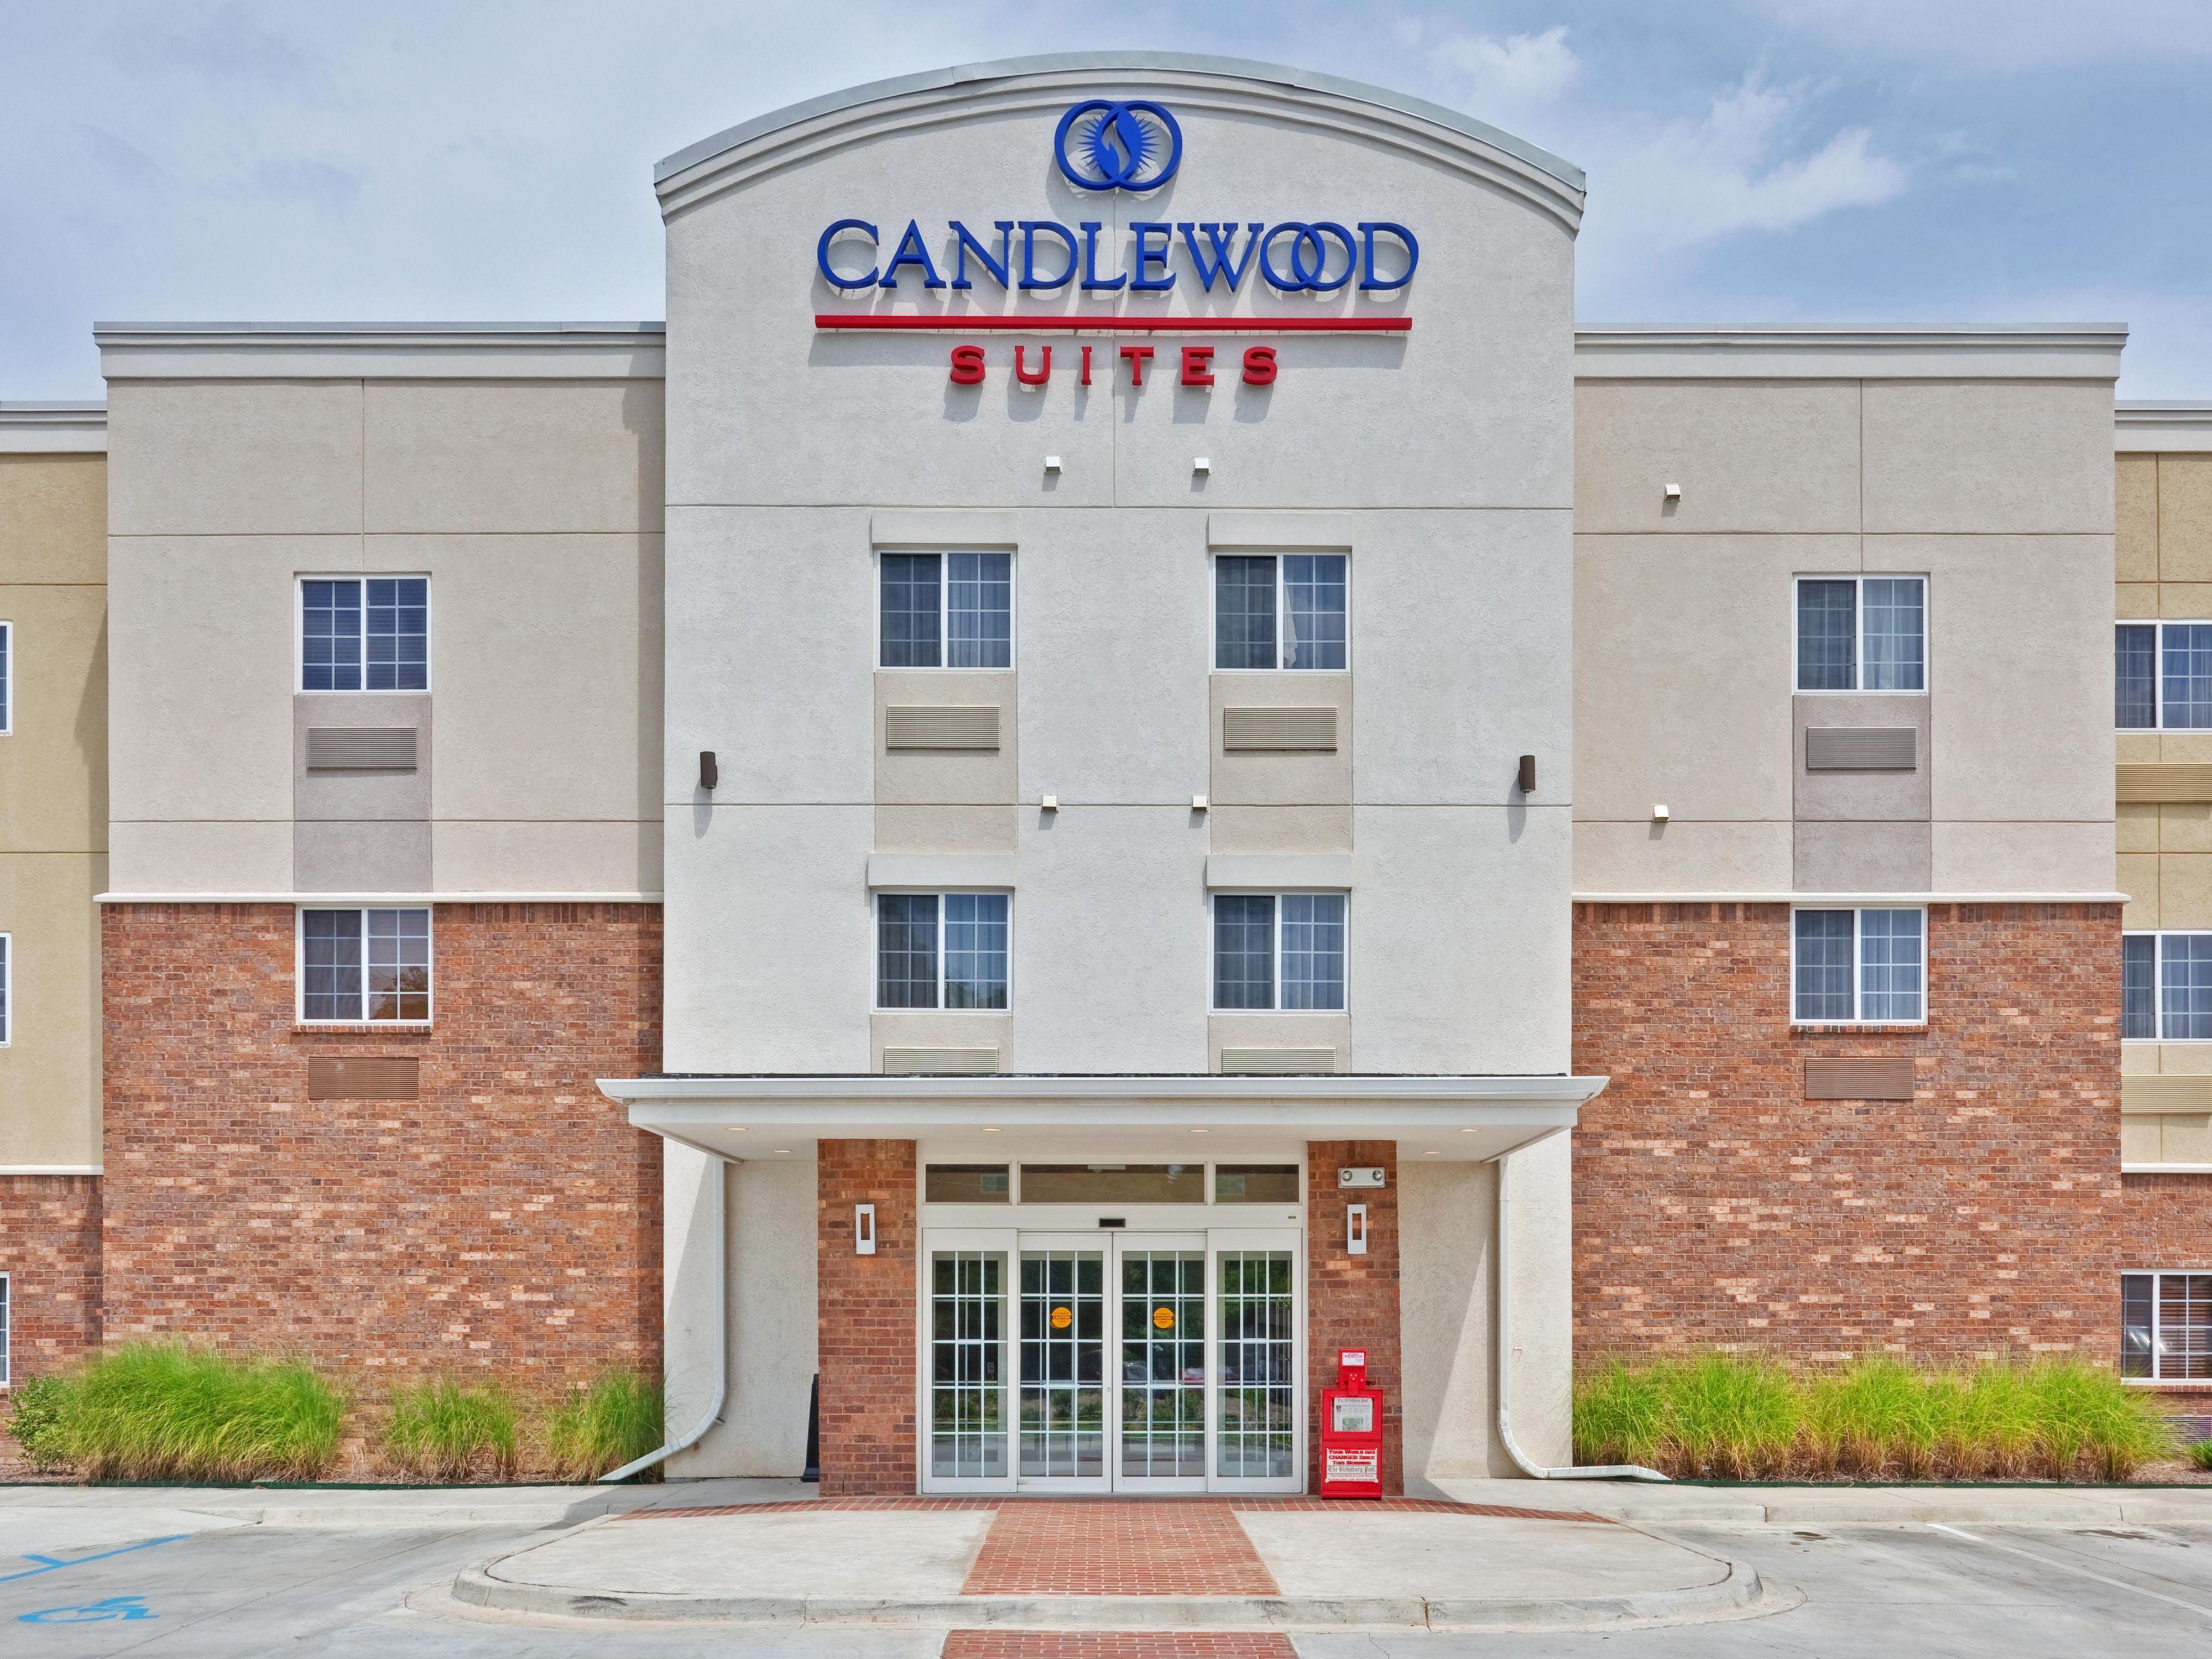 Candlewood Suites Vicksburg